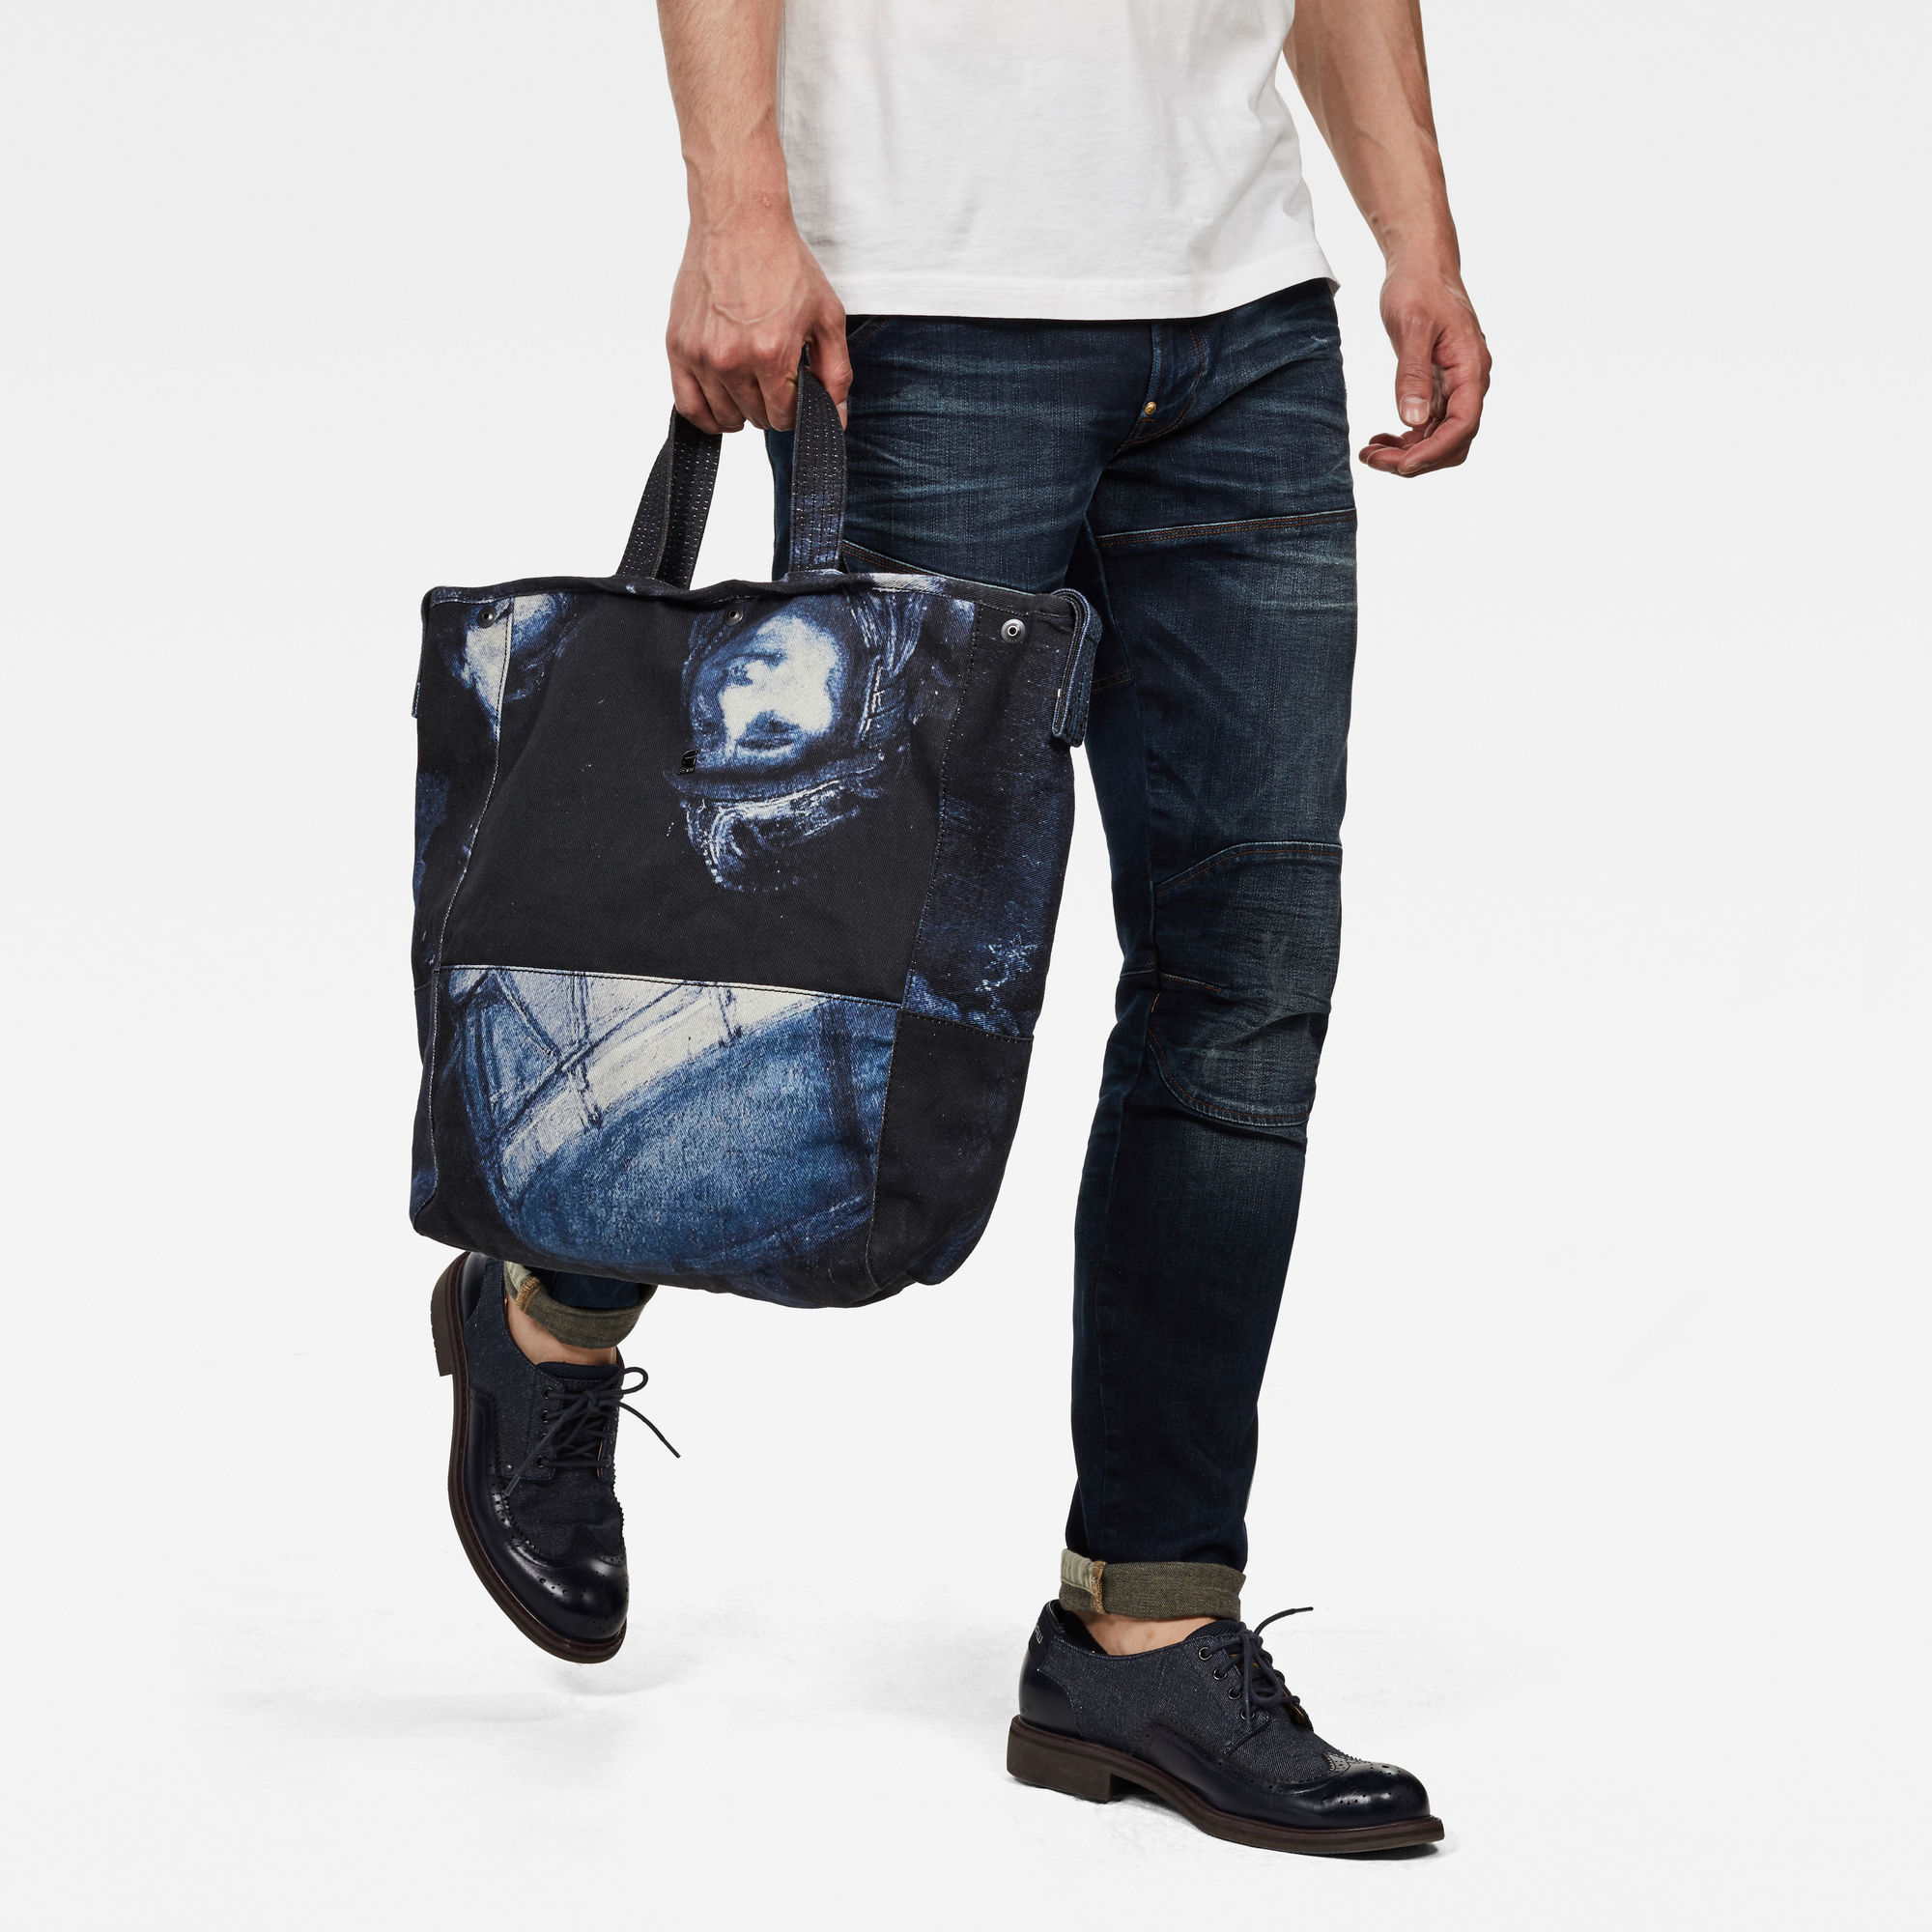 G-Star RAW Rijks Denim Shopper-tas All-over